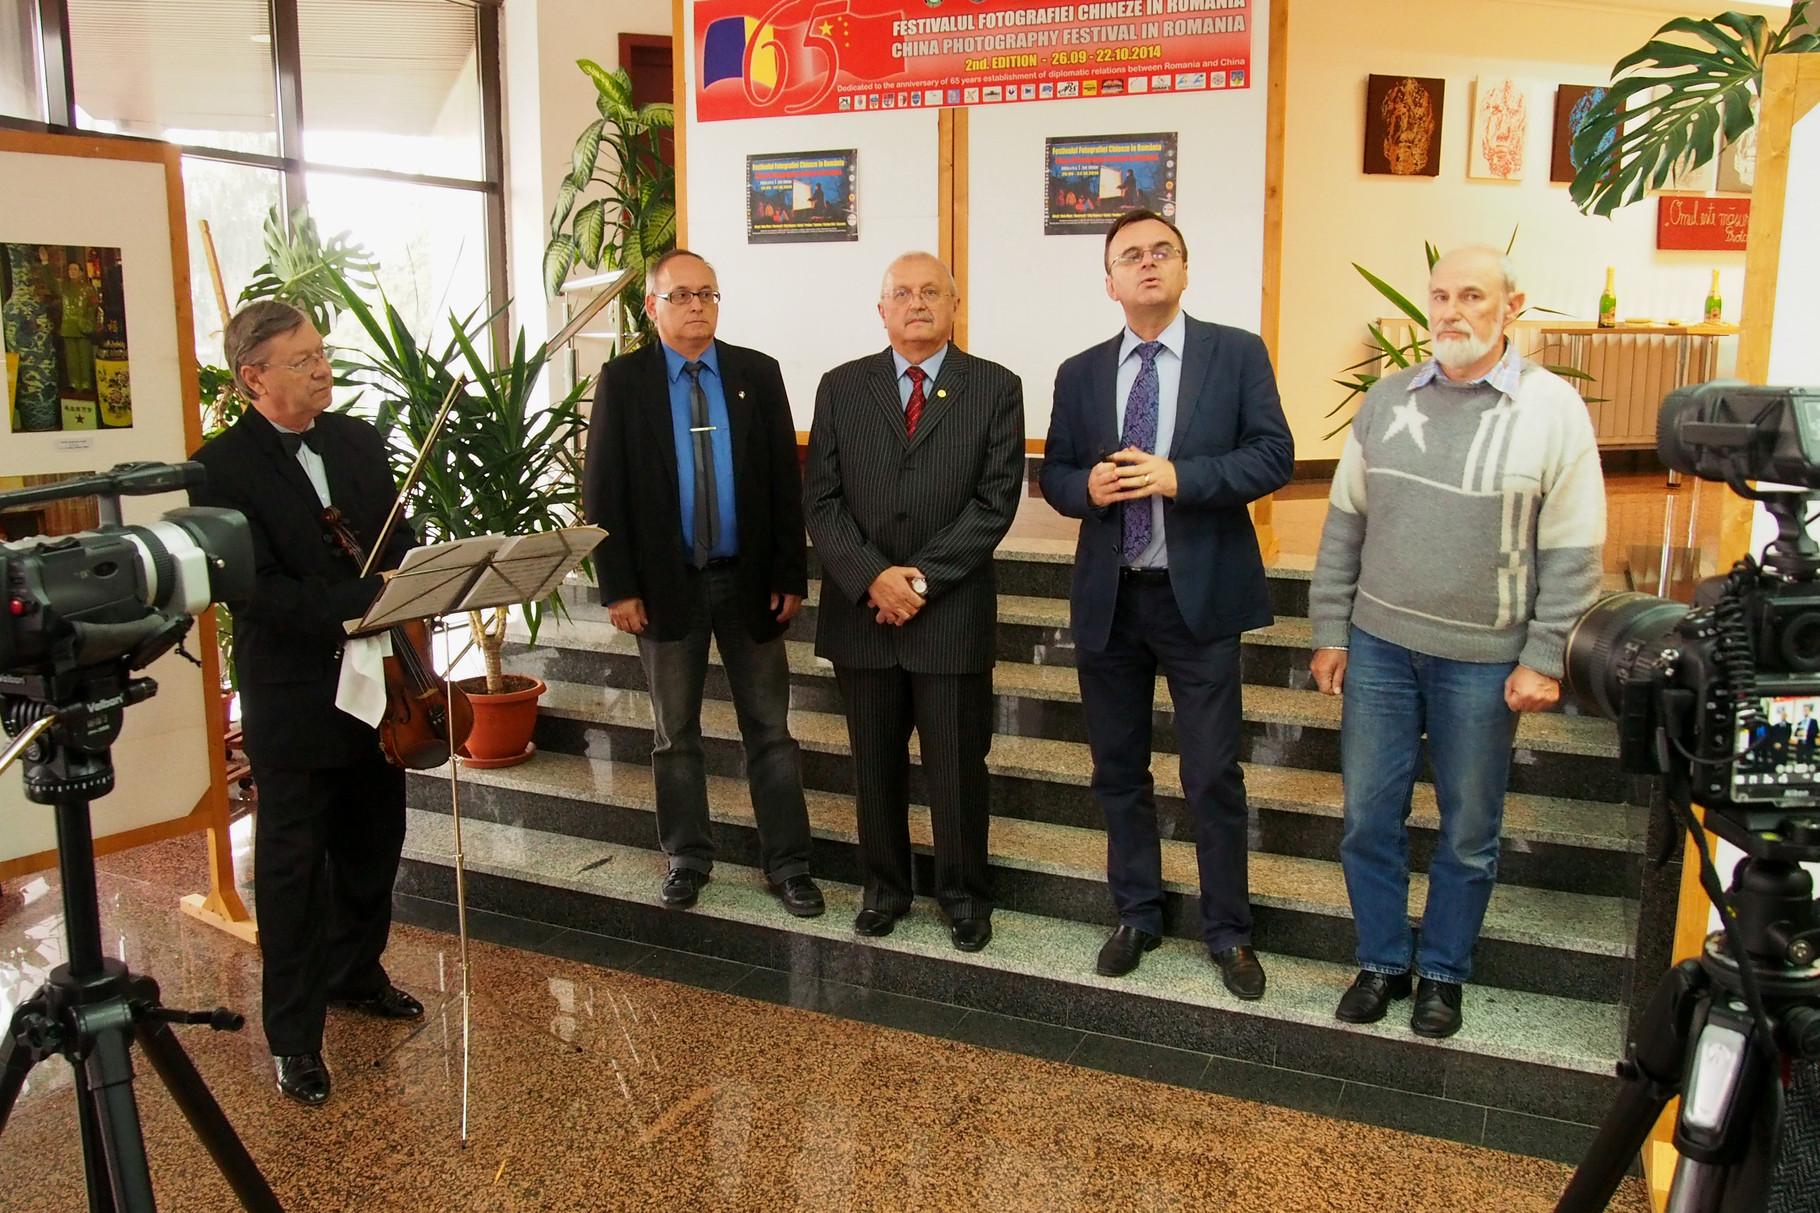 2014.22.10 - Baia Mare (RO)